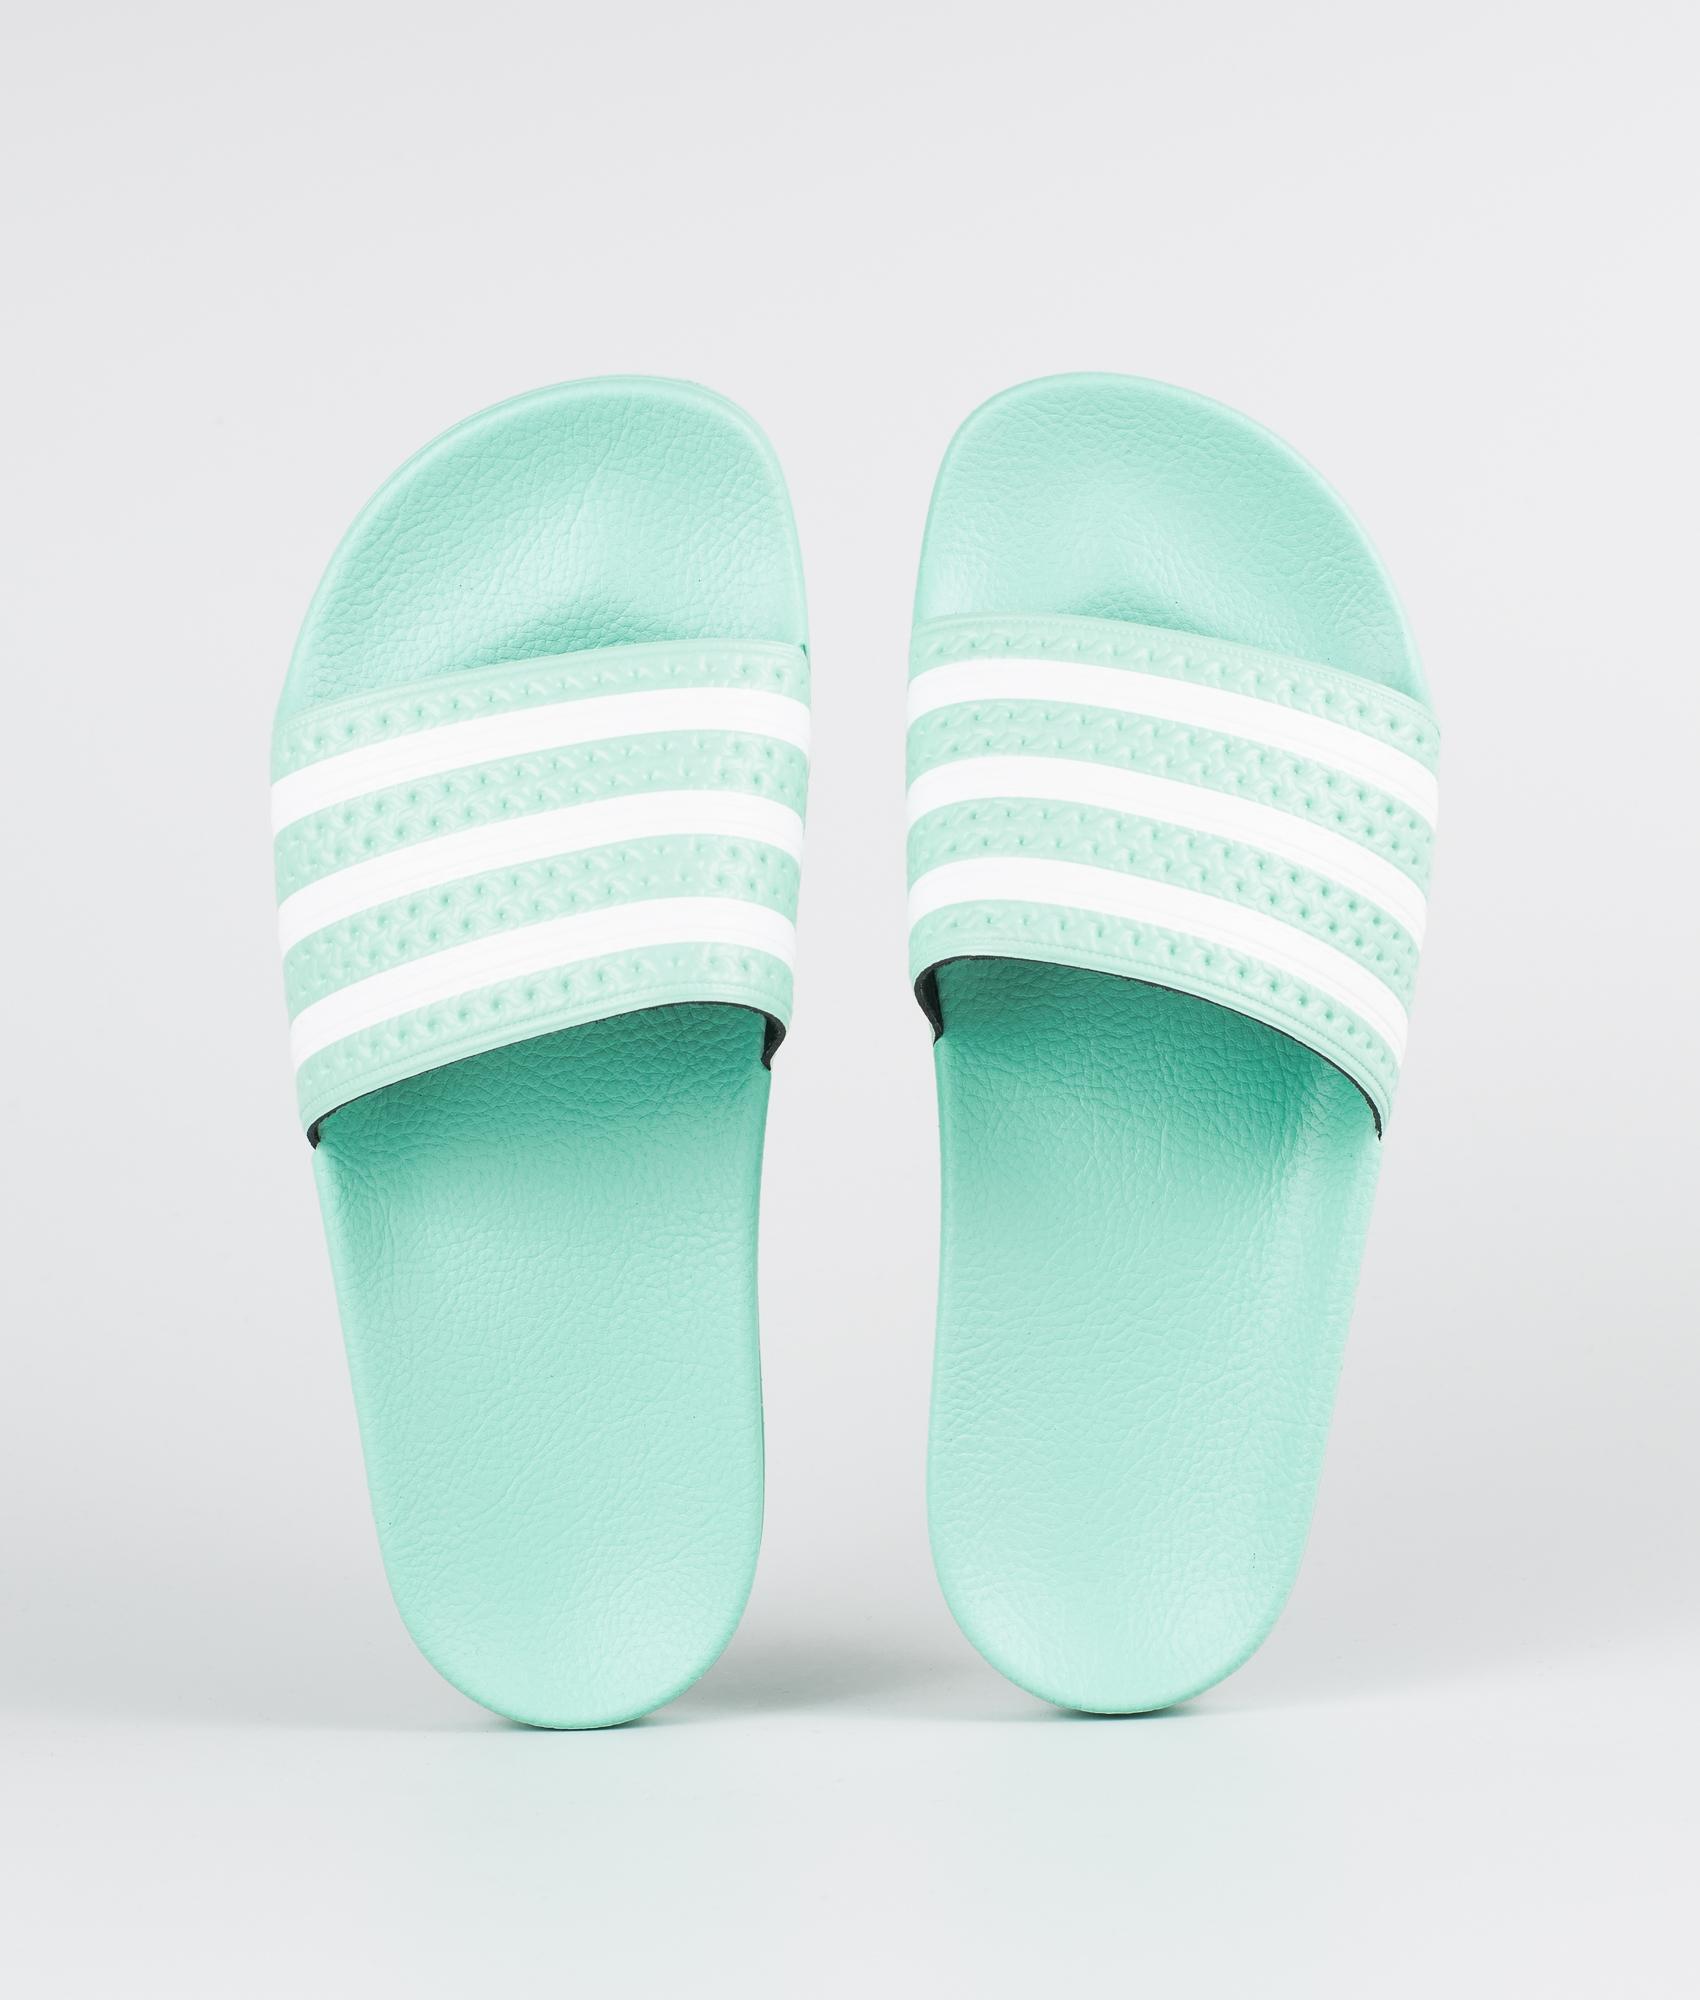 Adidas Originals Adilette Sandal Clear MintClear MintFtwr White